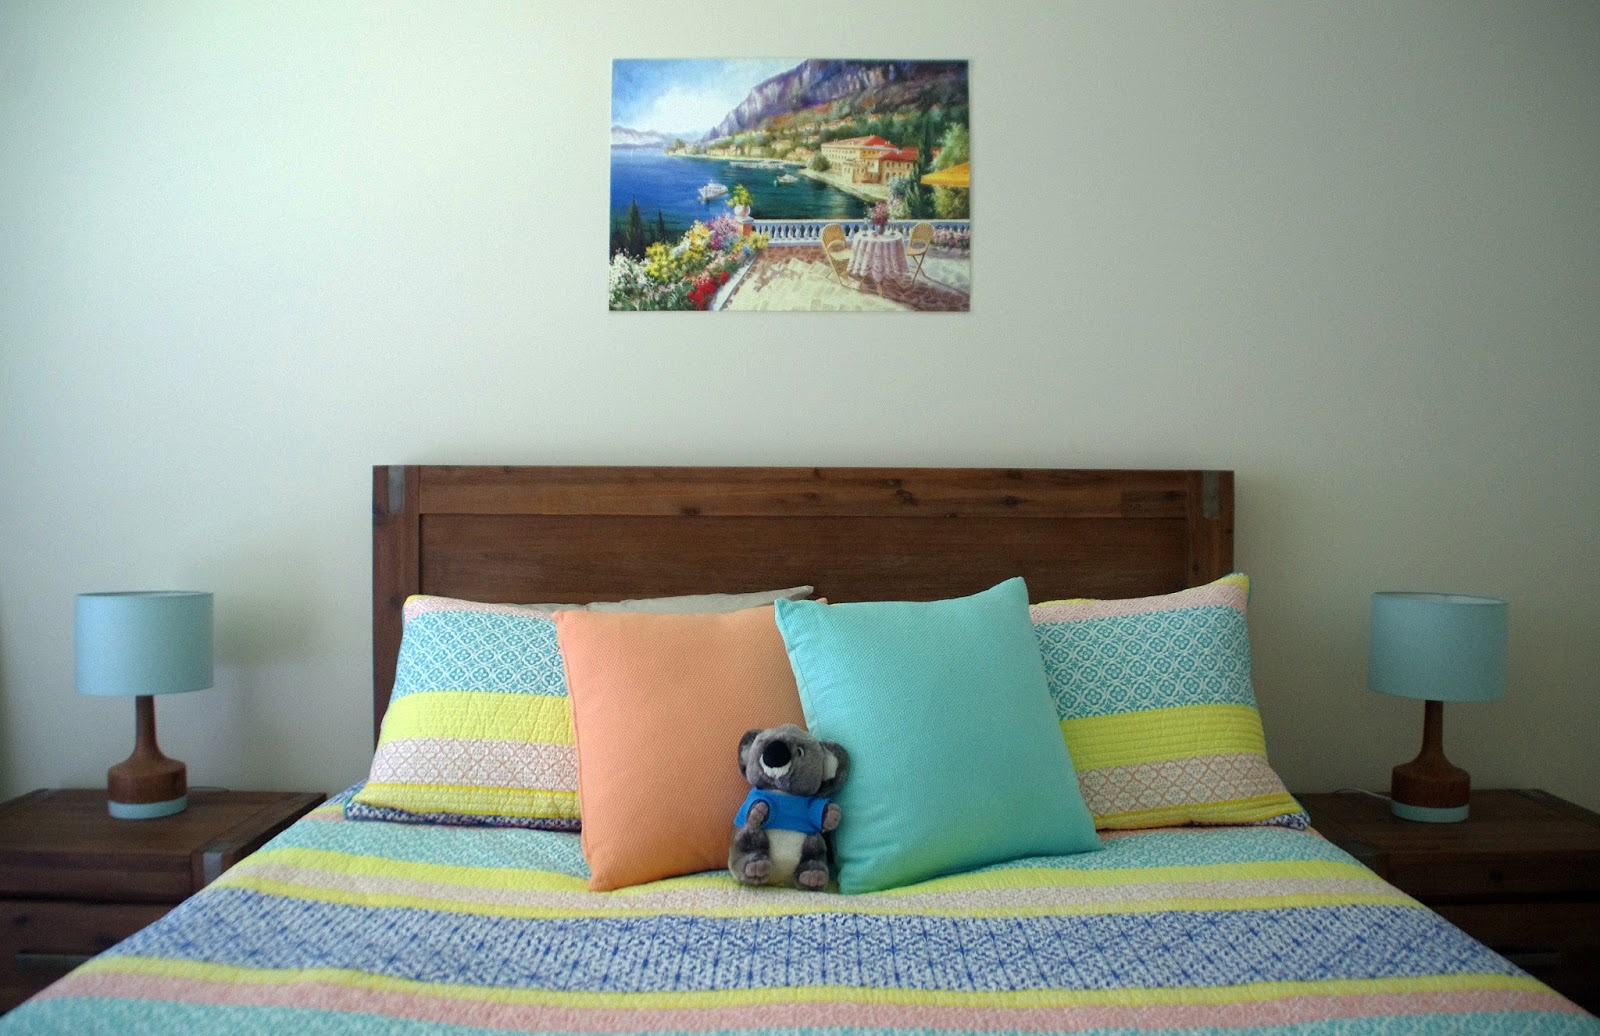 Coastal luxe bedroom decor